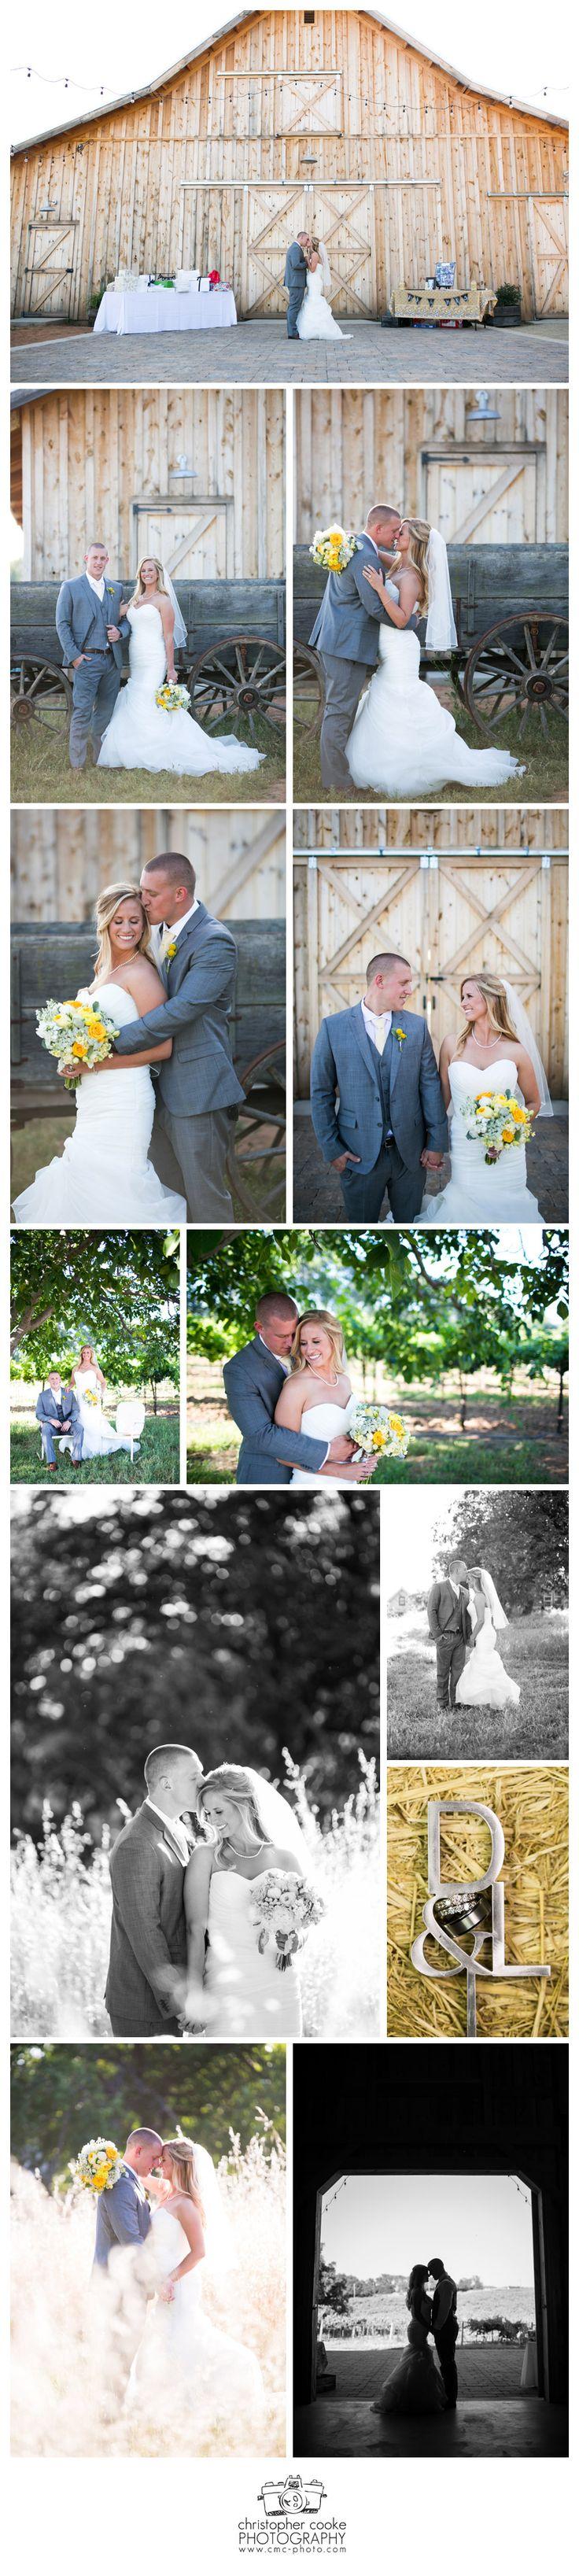 28 best weddings in fairfield california images on pinterest